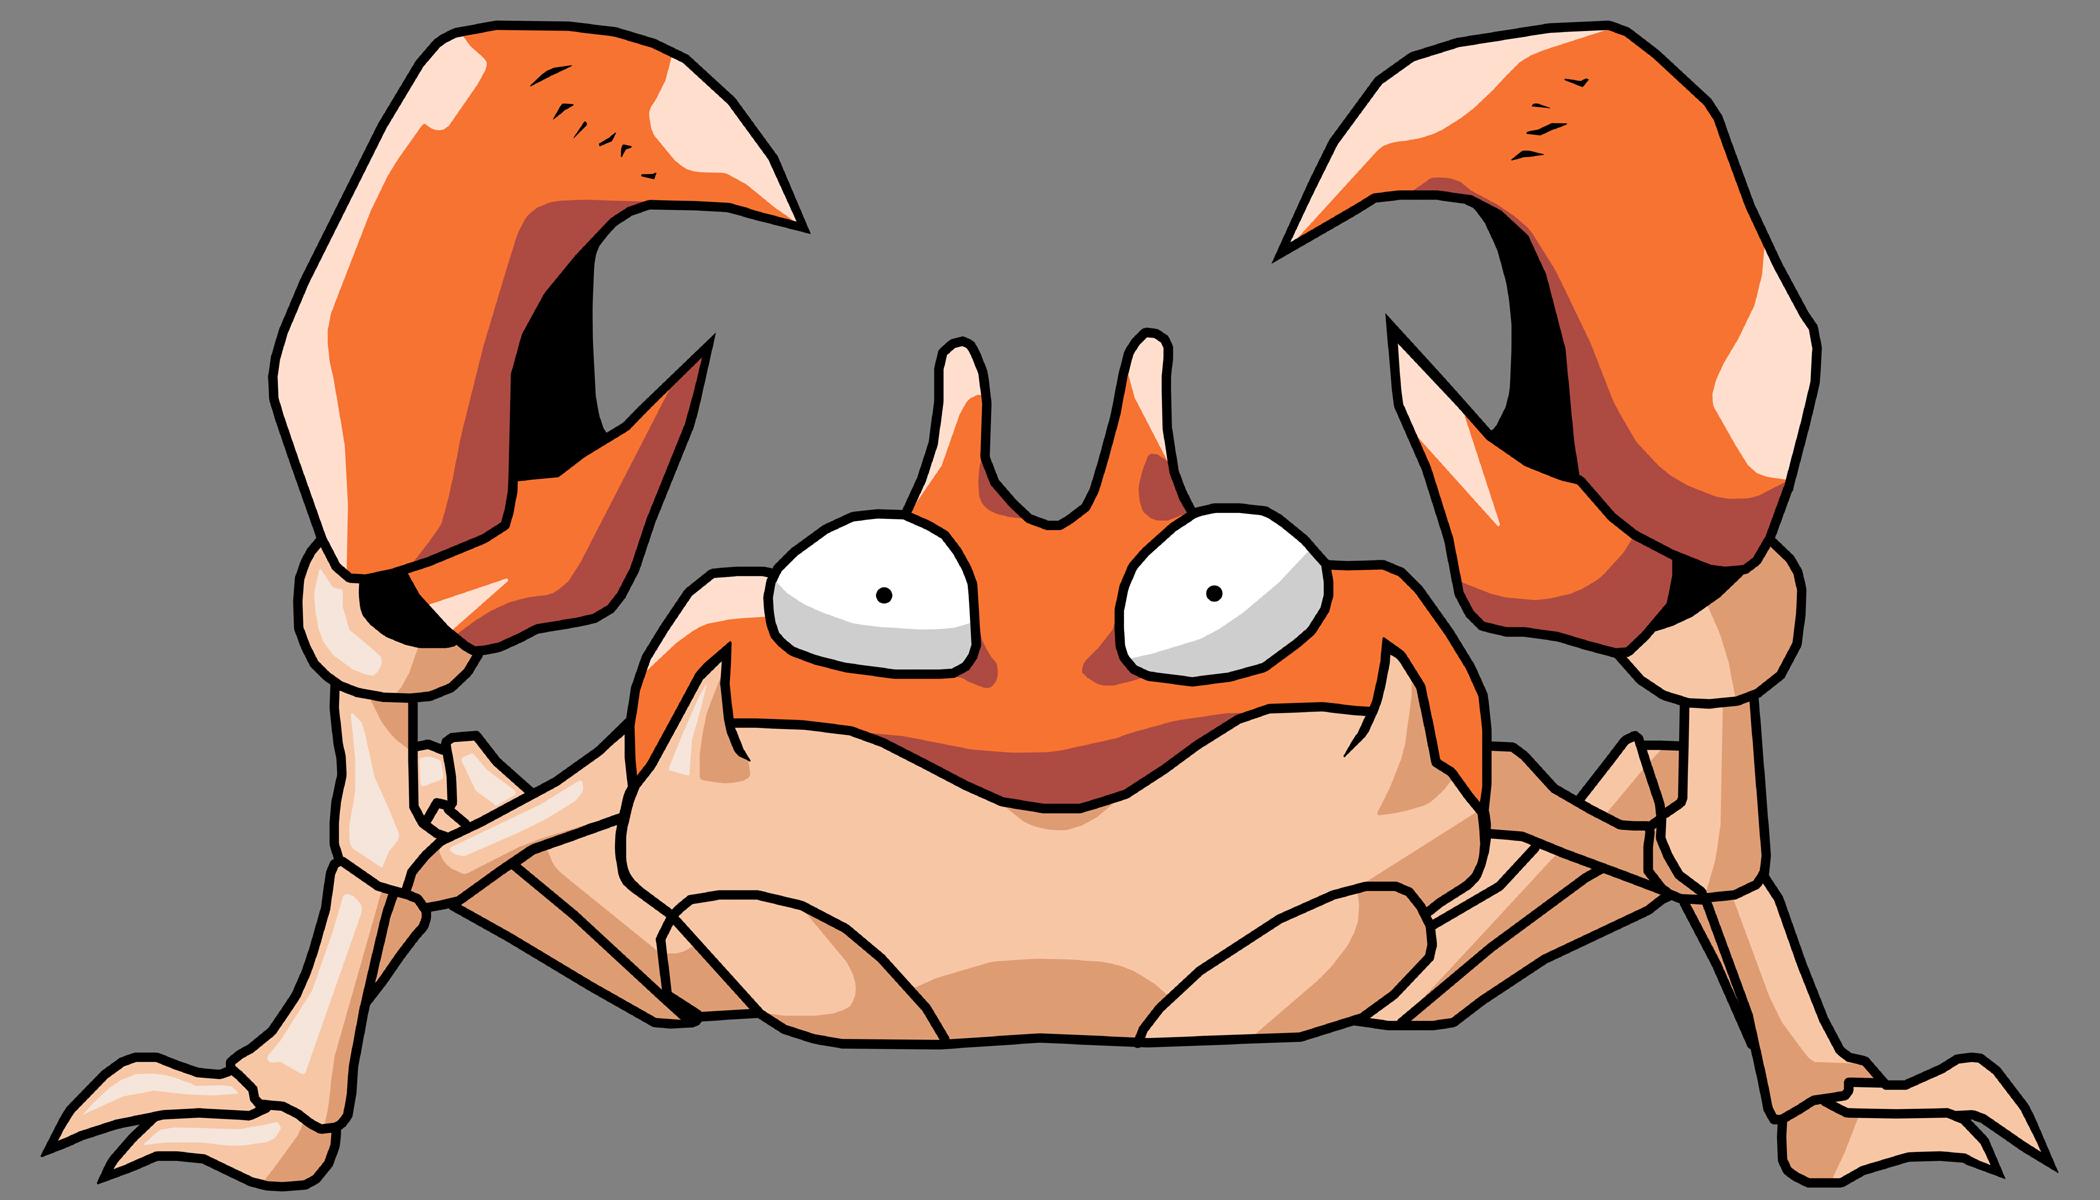 Krabby Pokemon Go Seine-saint-denis